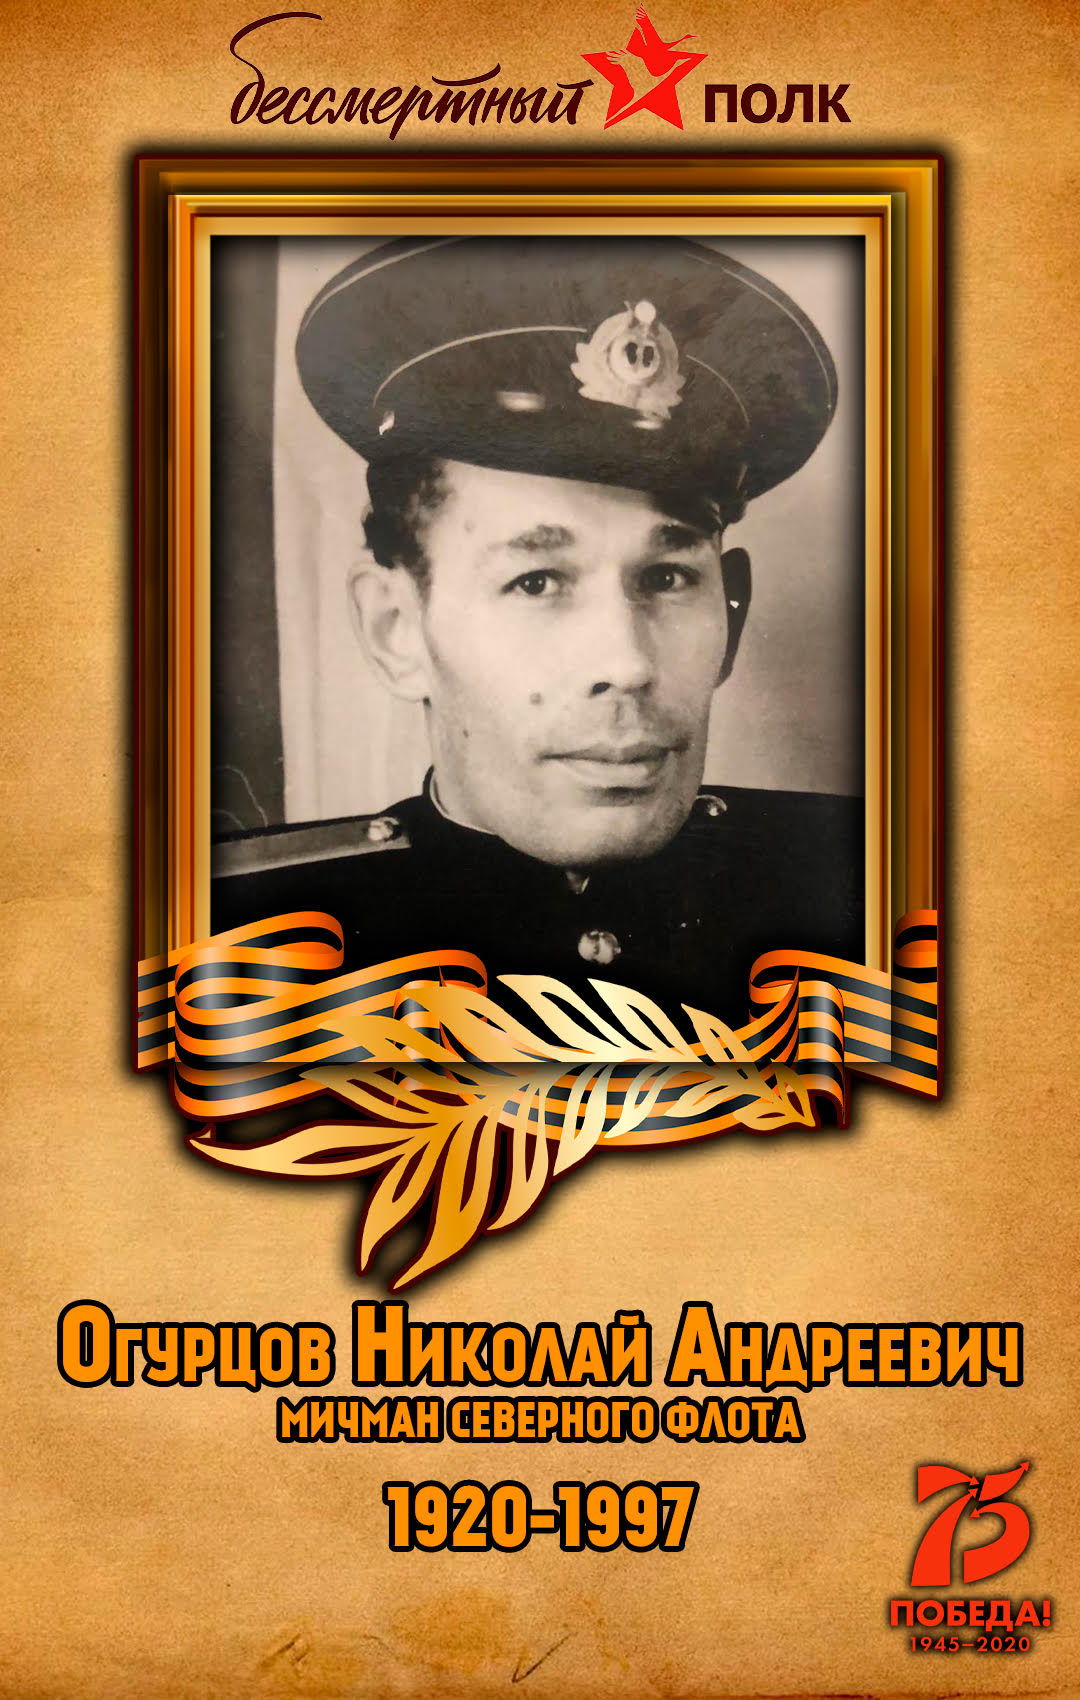 Огурцов-Николай-Андреевич